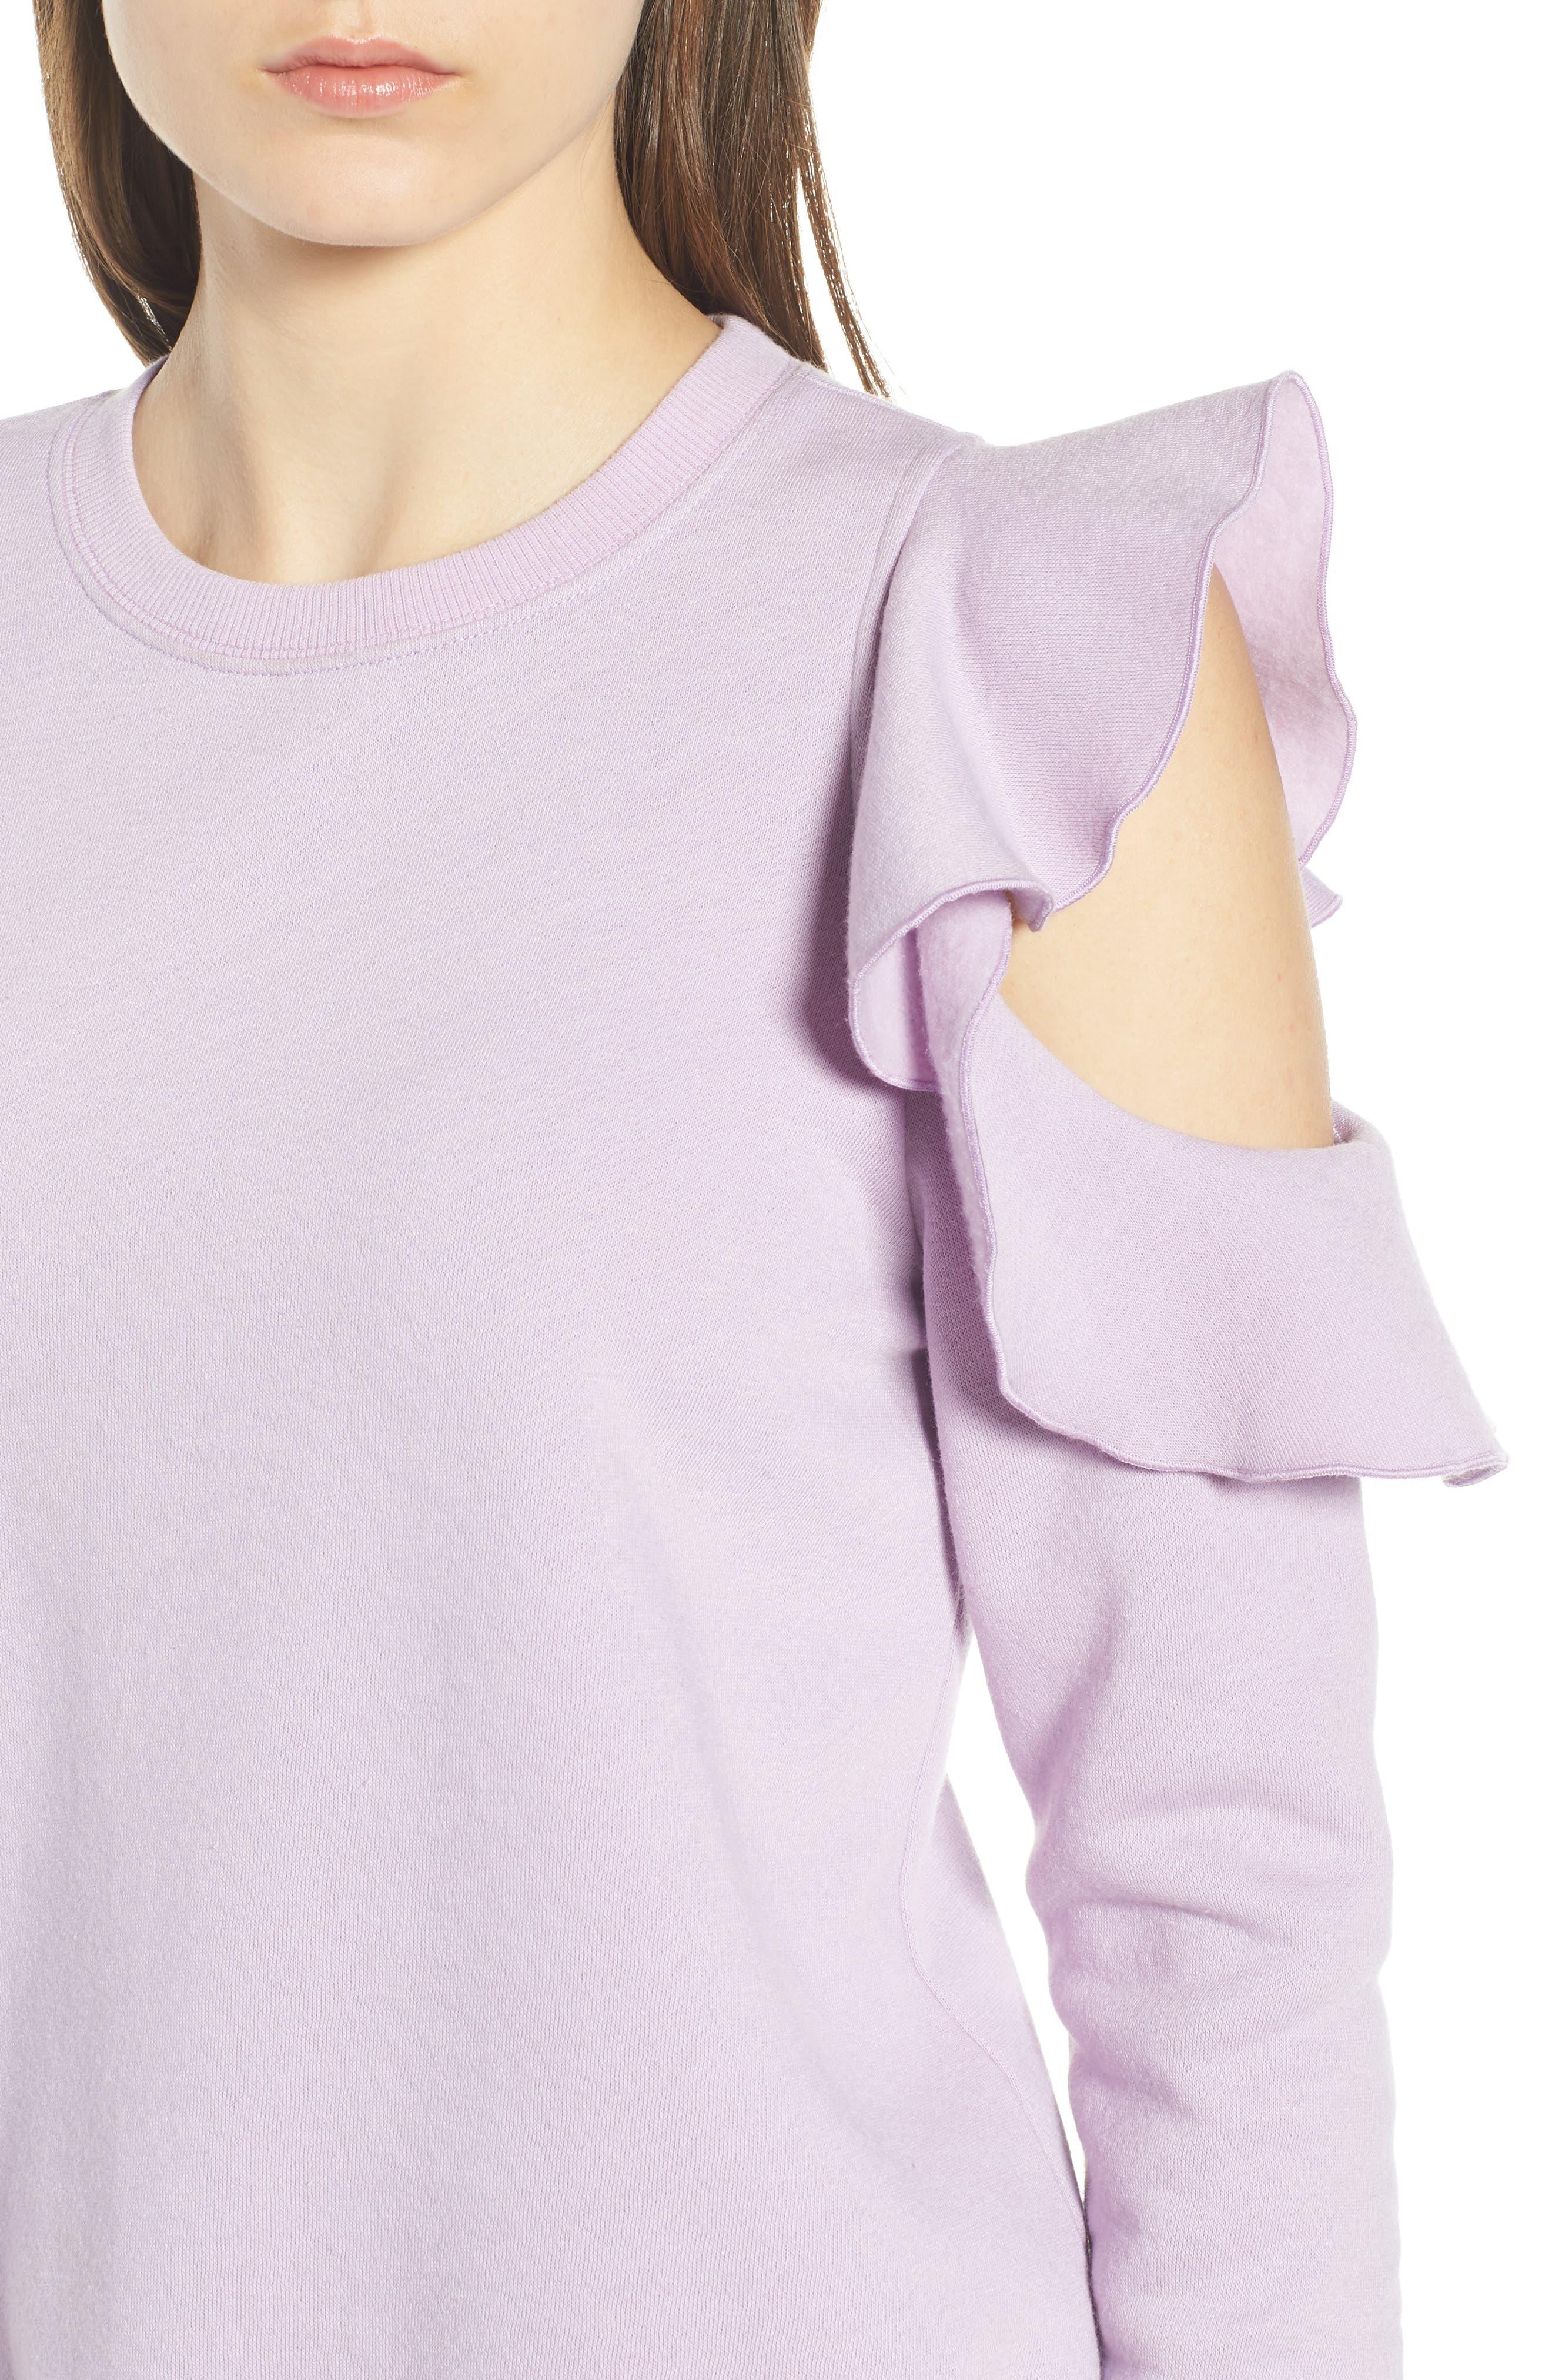 REBECCA MINKOFF, Gracie Cold Shoulder Sweatshirt, Alternate thumbnail 5, color, 502